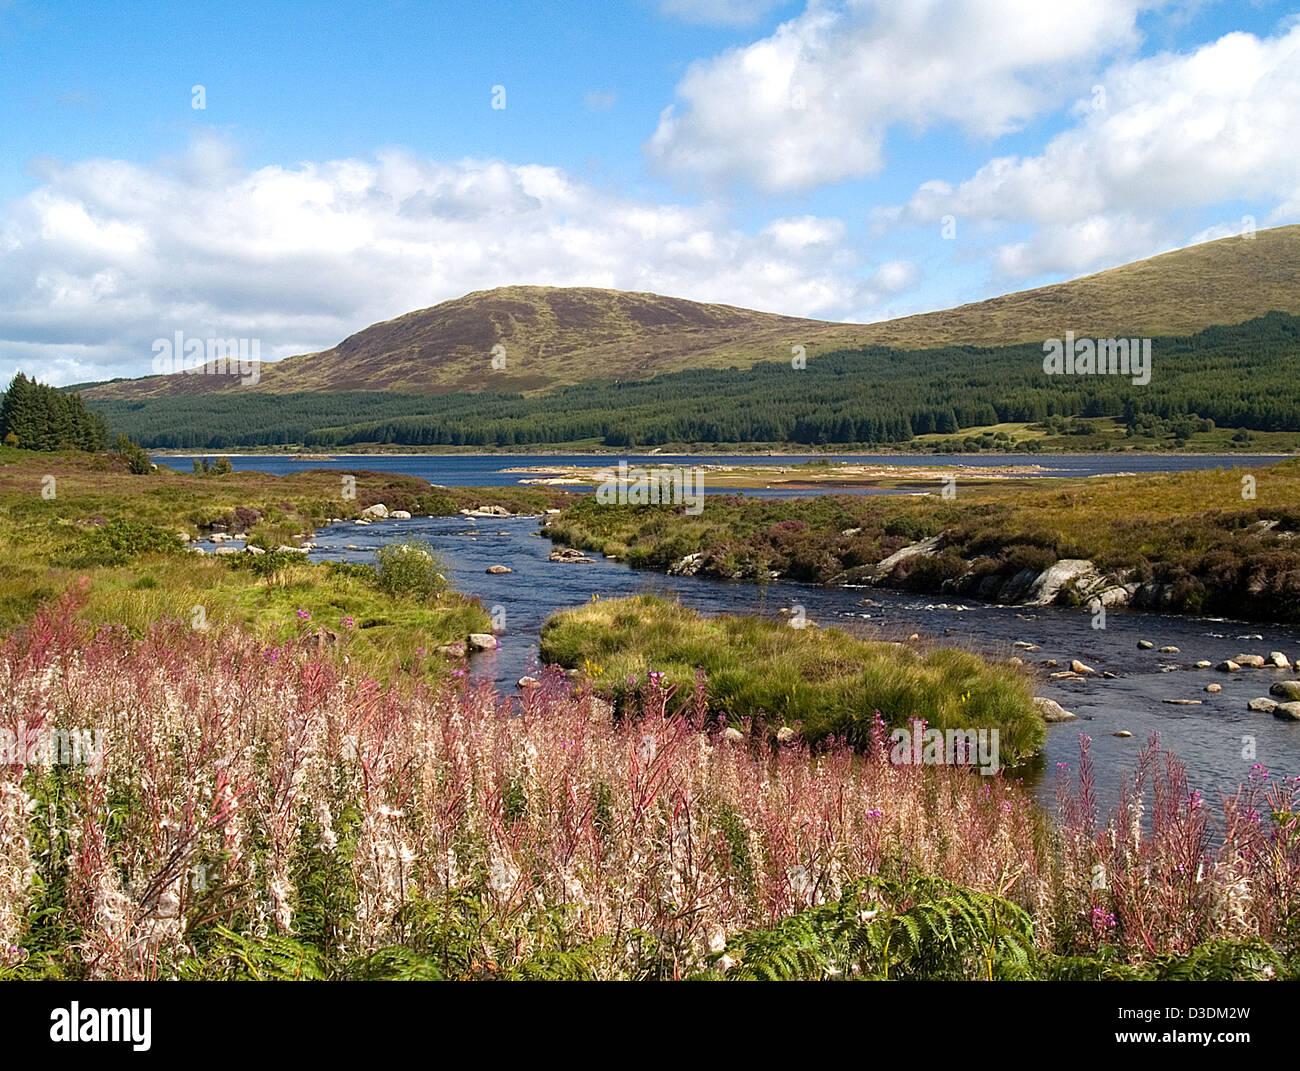 Loch Doon, Galloway Forrest Park - Stock Image